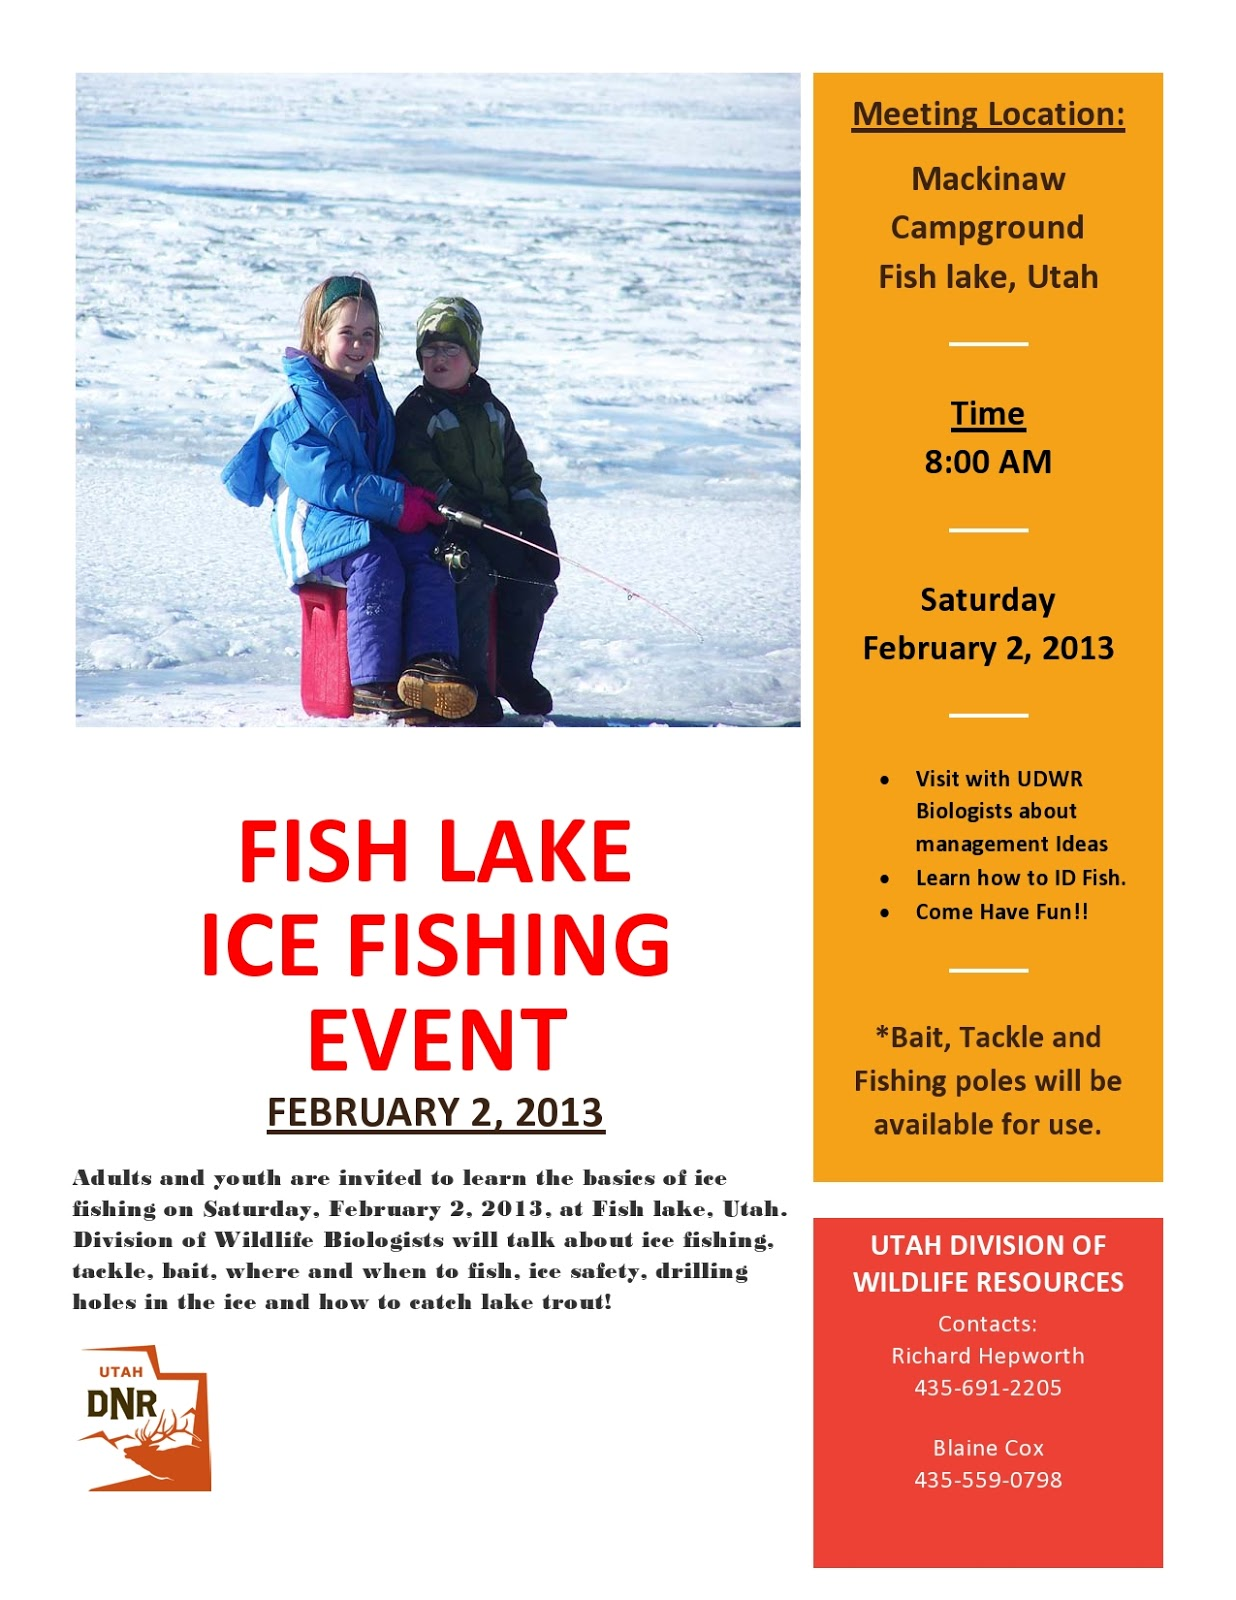 Southern utah hunt and fish jan 12 2013 for Panguitch lake fishing report